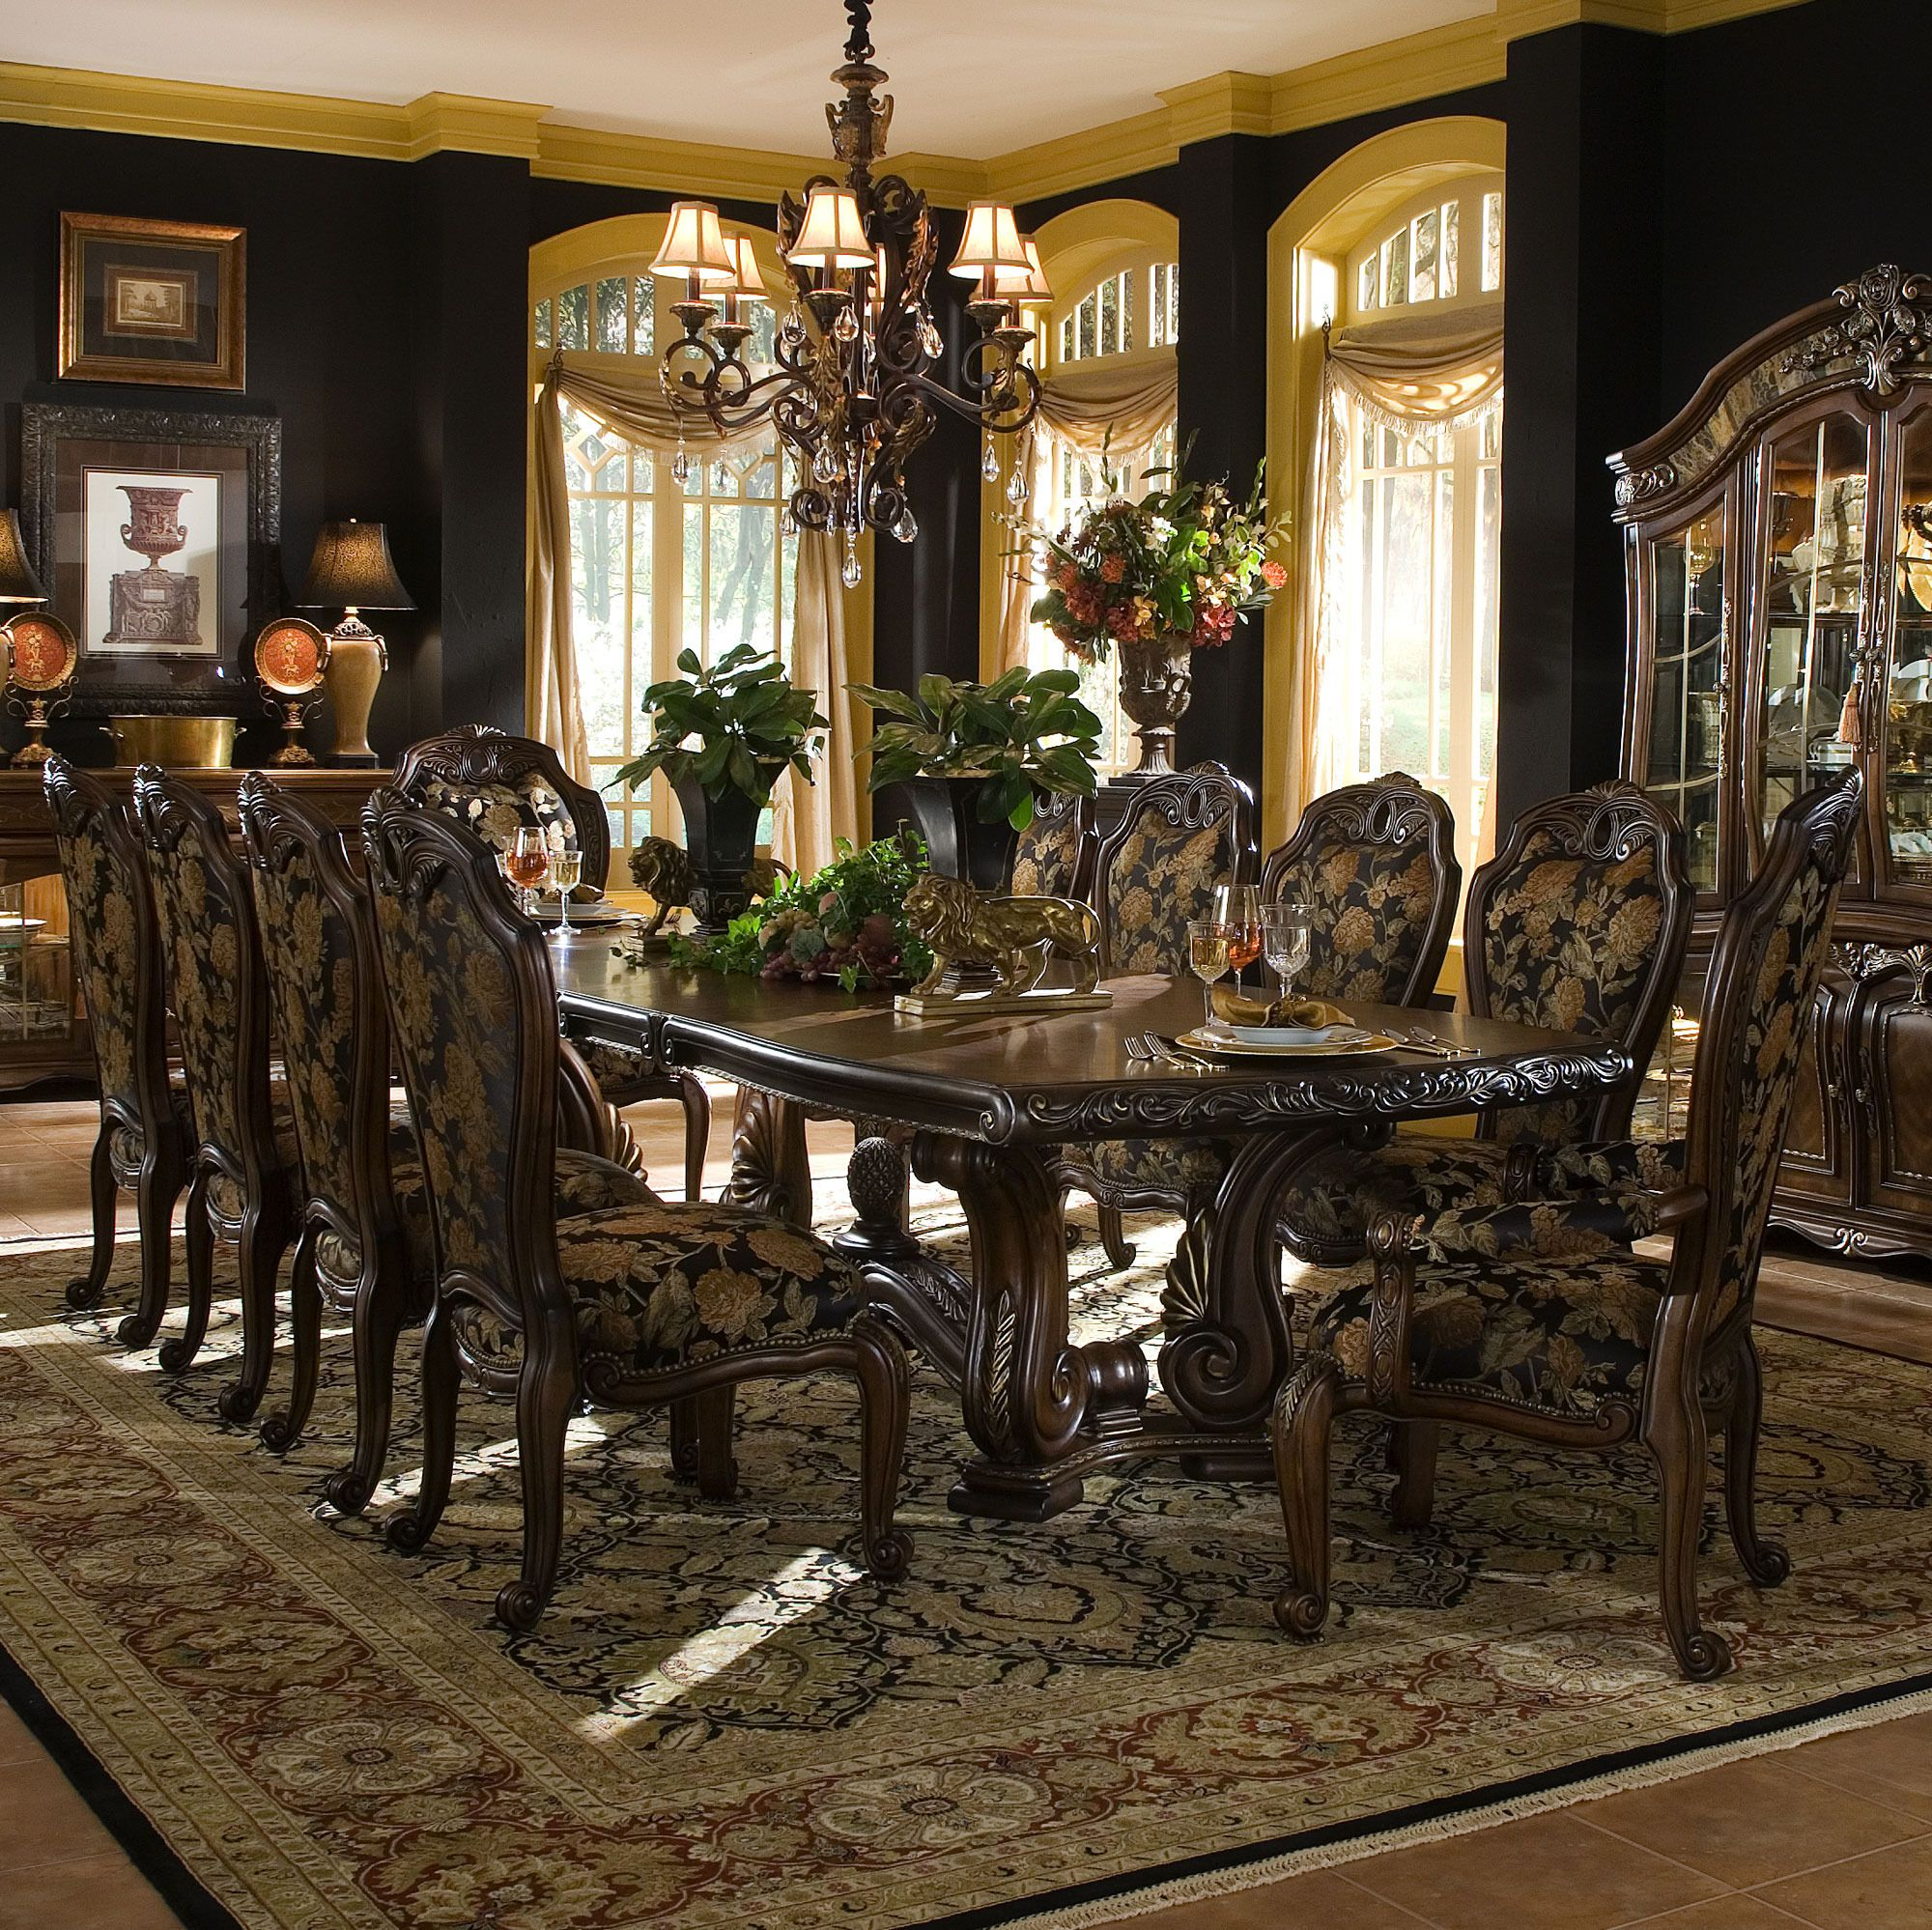 Room Store Dining Room Sets: Oppulente Rectangular Table Dining Room Set